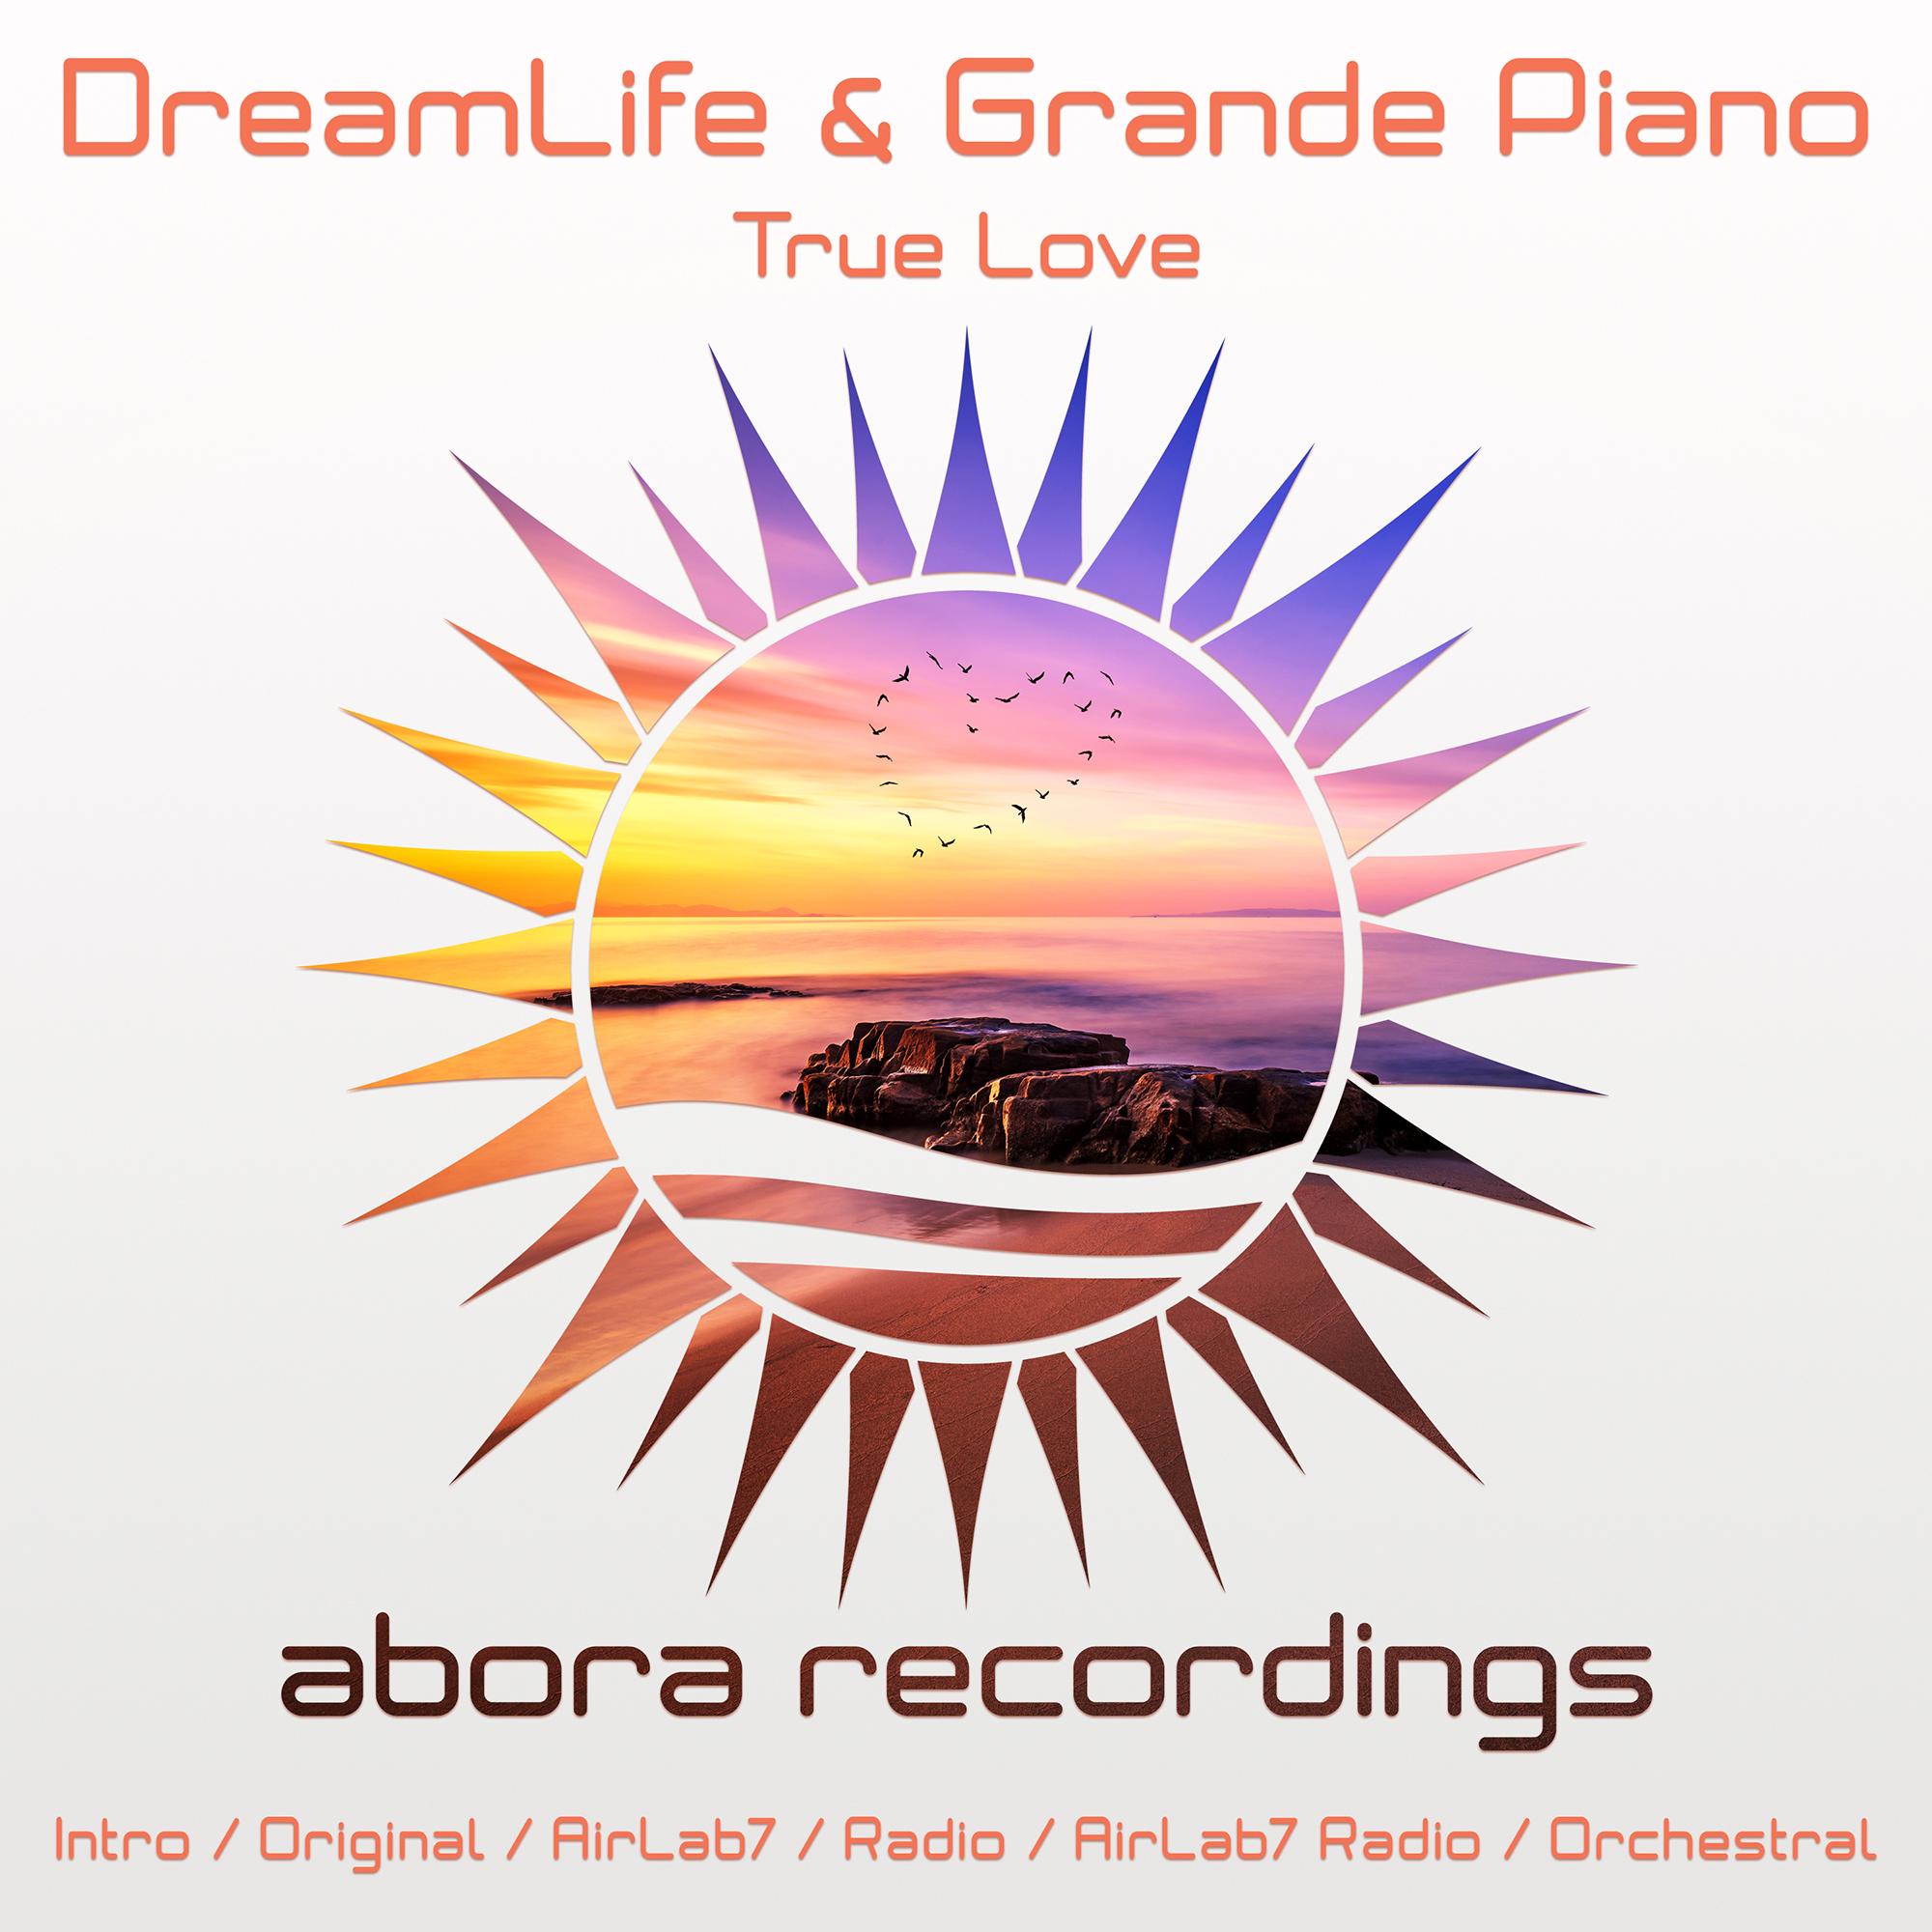 DreamLife & Grande Piano – True Love